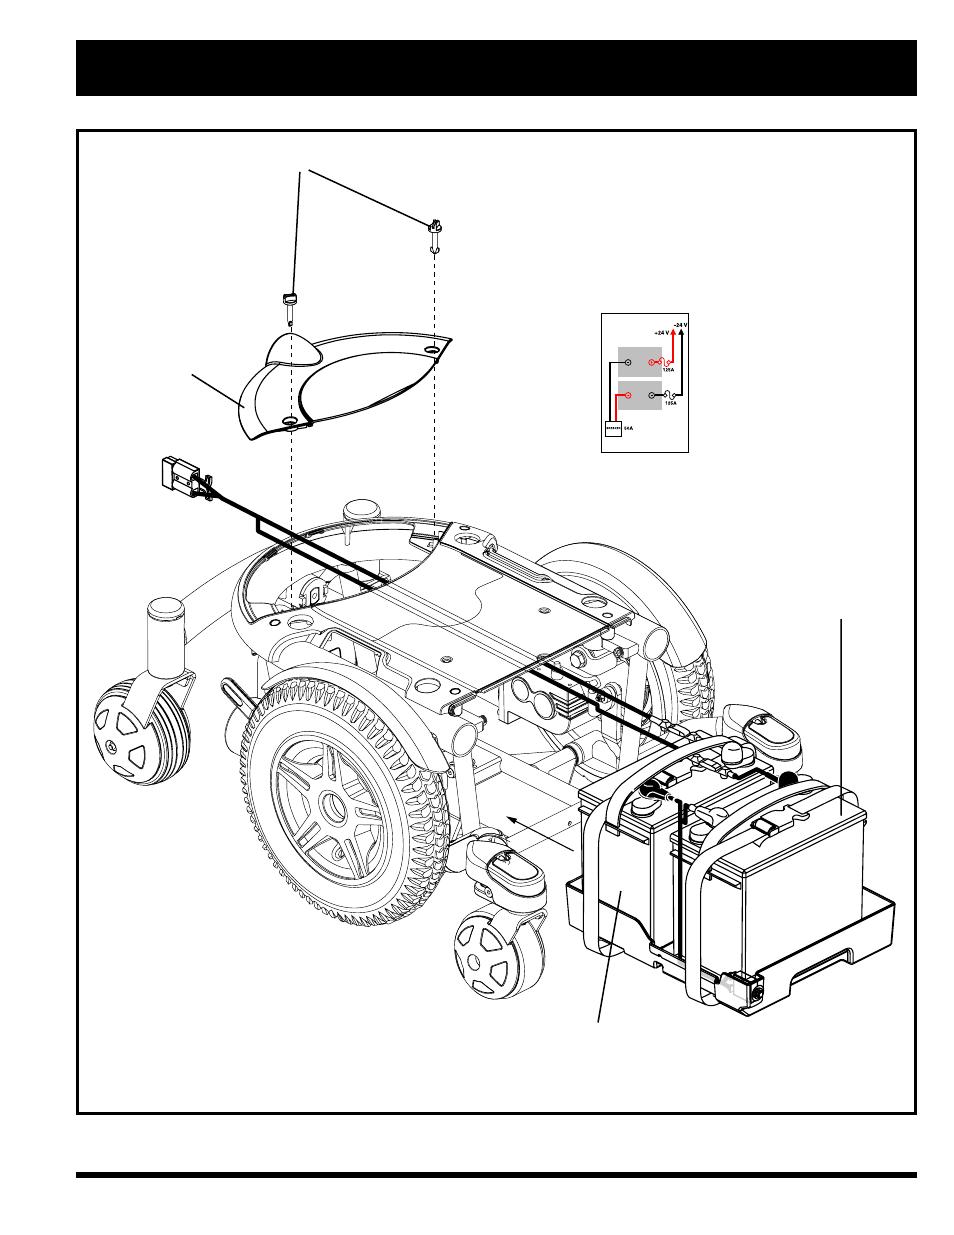 medium resolution of jazzy pride wiring diagram wiring diagram review jazzy scooter wiring diagram